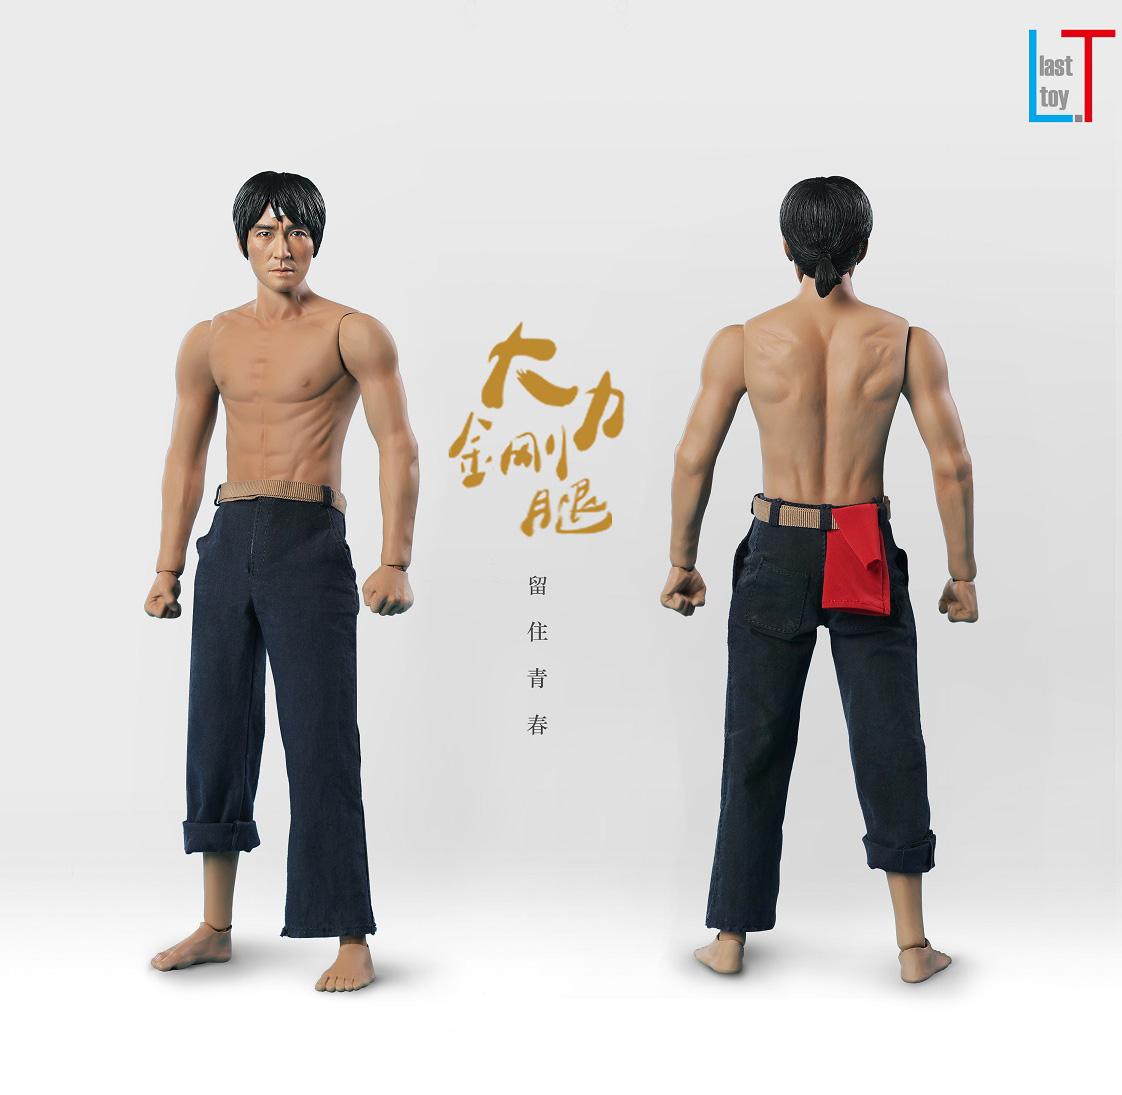 Last Toys (L.T studio) LT003 Shaolin & Soccer - Asing (Body & Headsculpt)